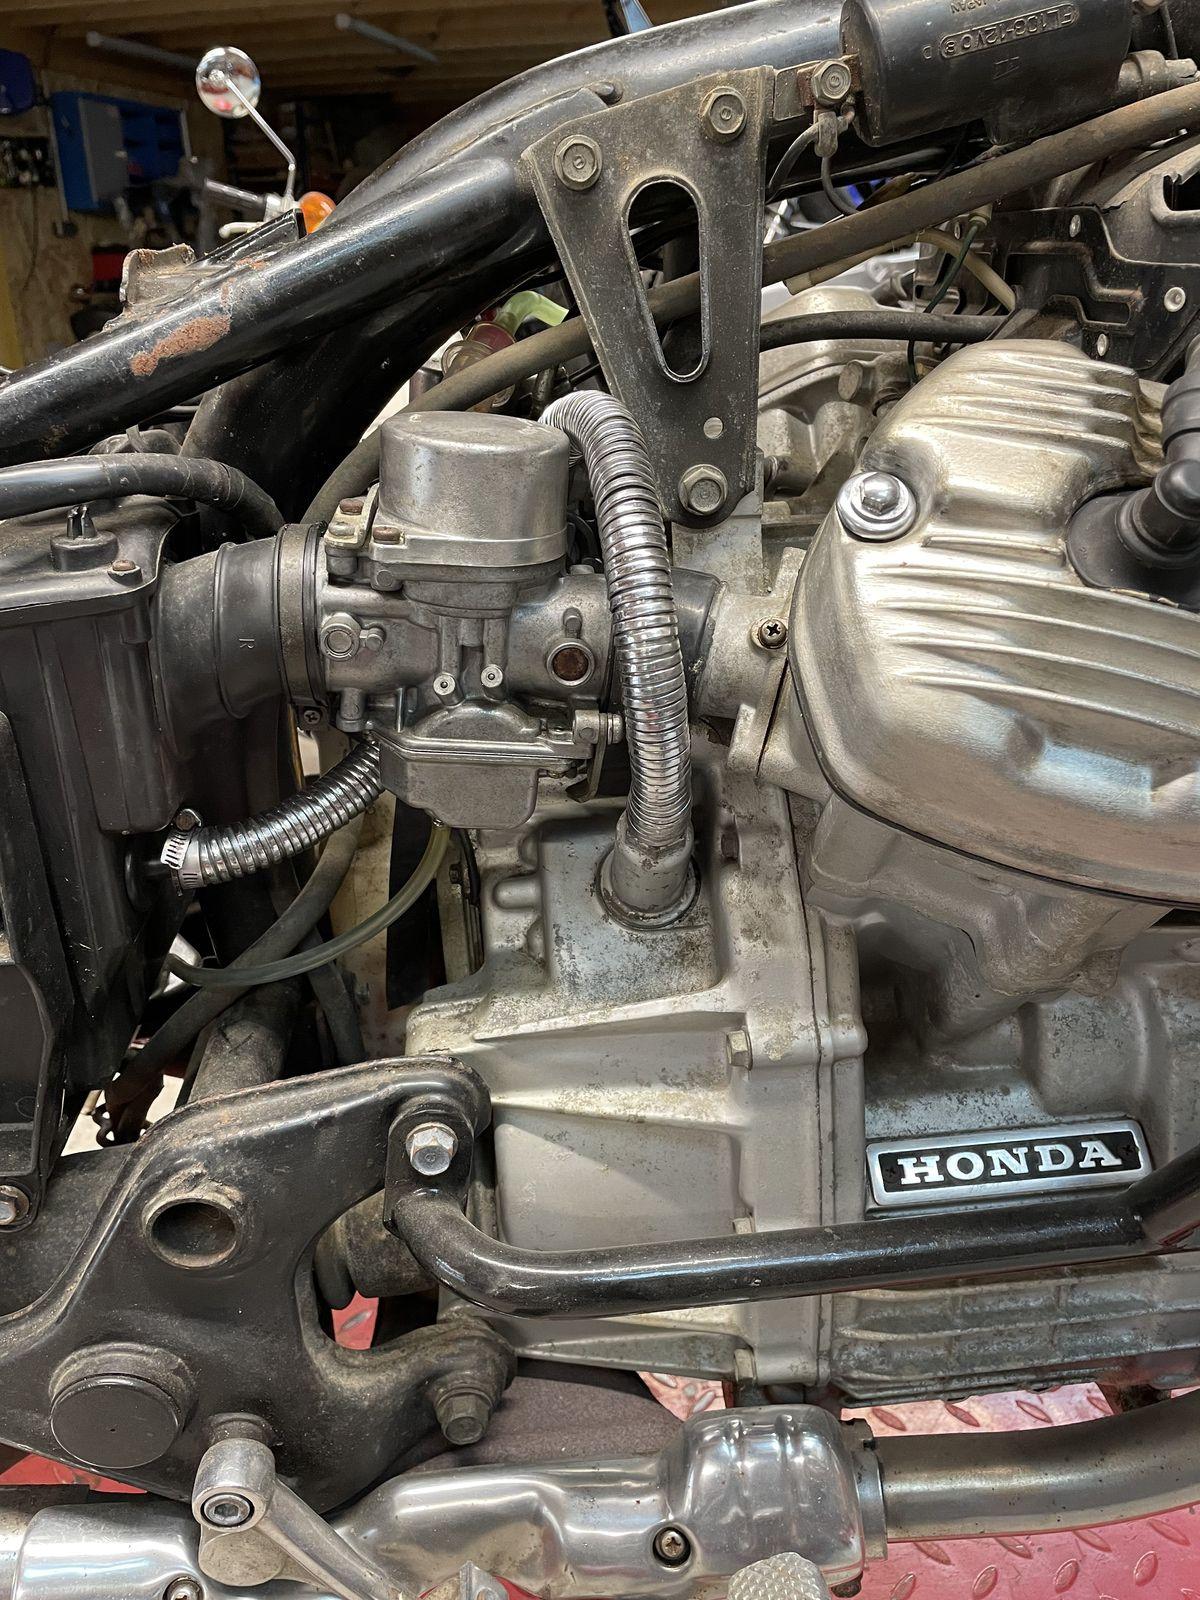 HONDA CX 500 VENANT DU 40